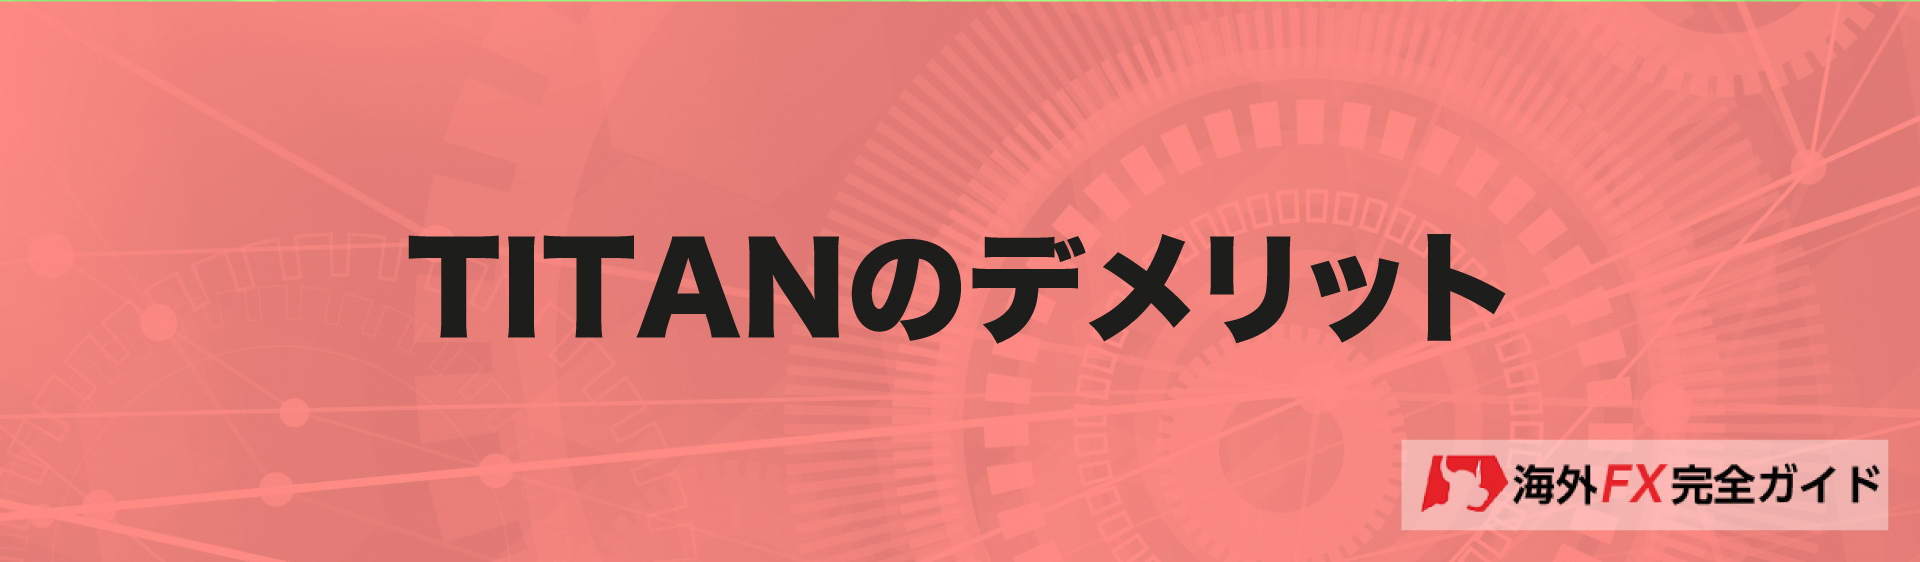 Titan FXのデメリット